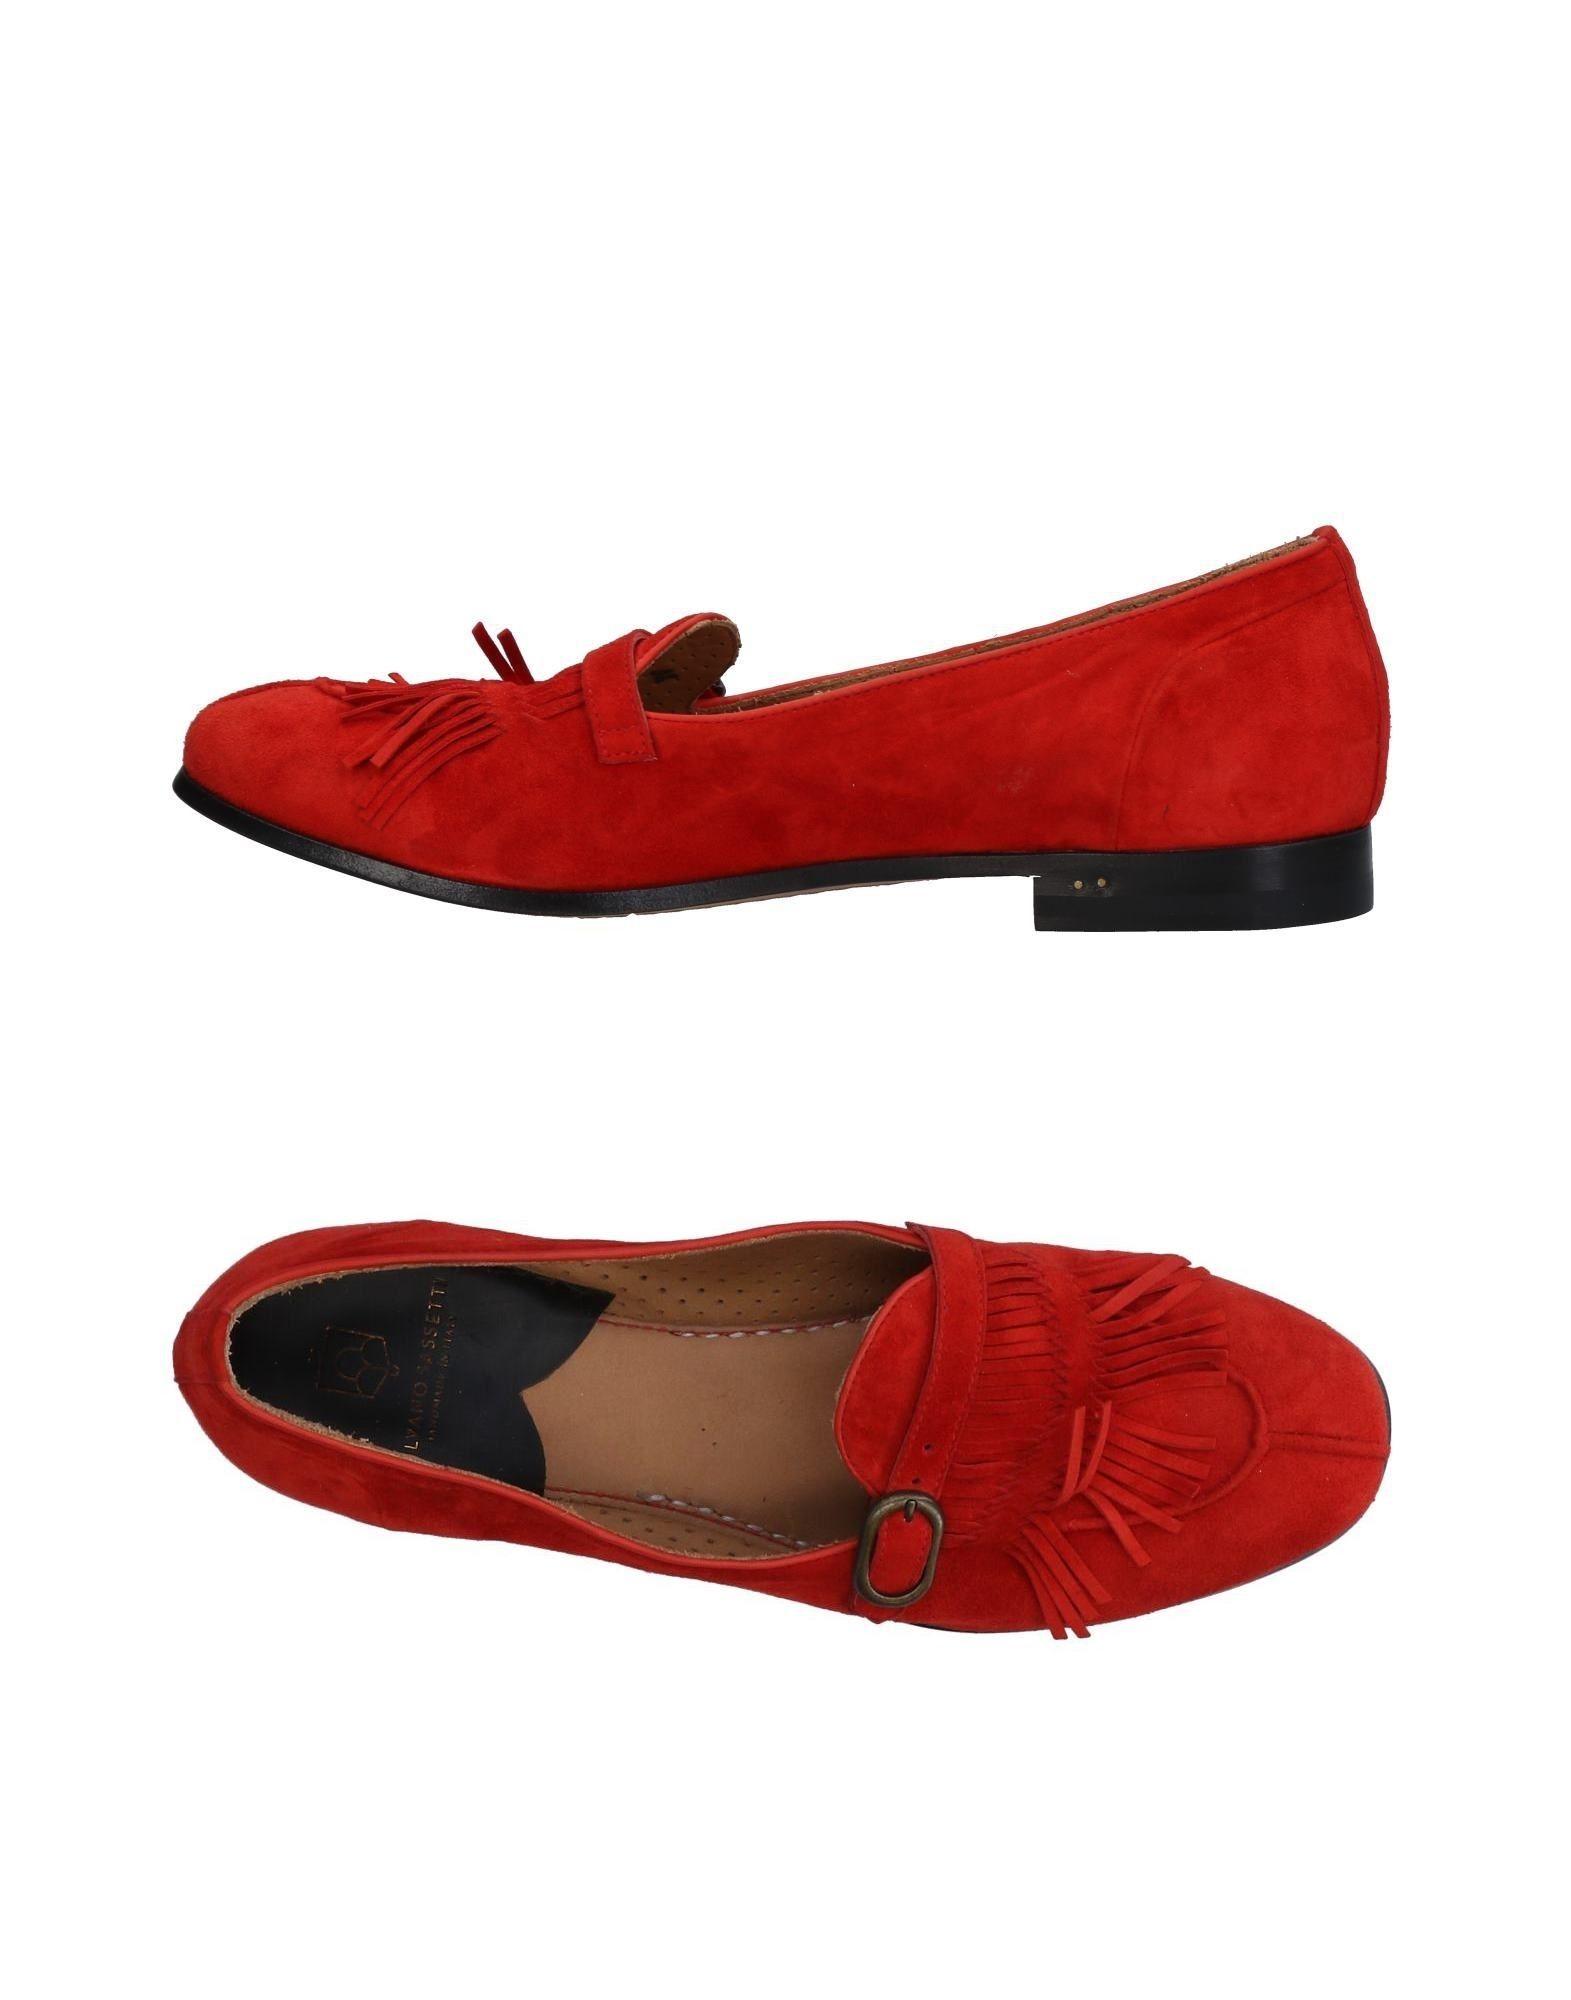 Silvano Sassetti Mokassins Schuhe Damen  11457985QL Beliebte Schuhe Mokassins bd6e18